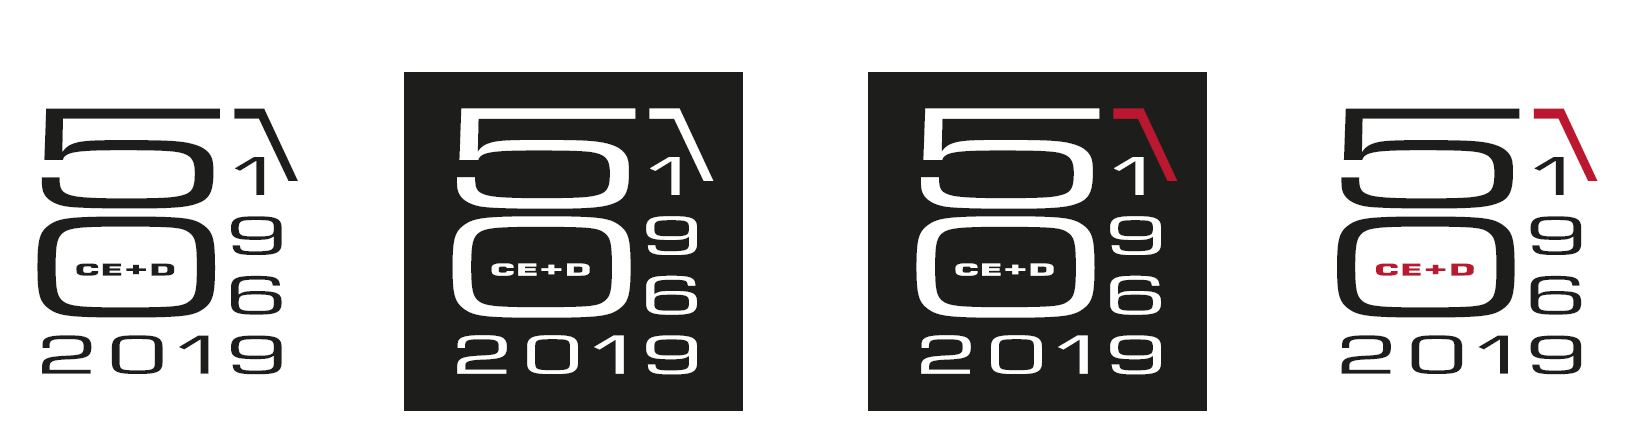 Karlie Roper wins 50th Anniversary Logo design competition